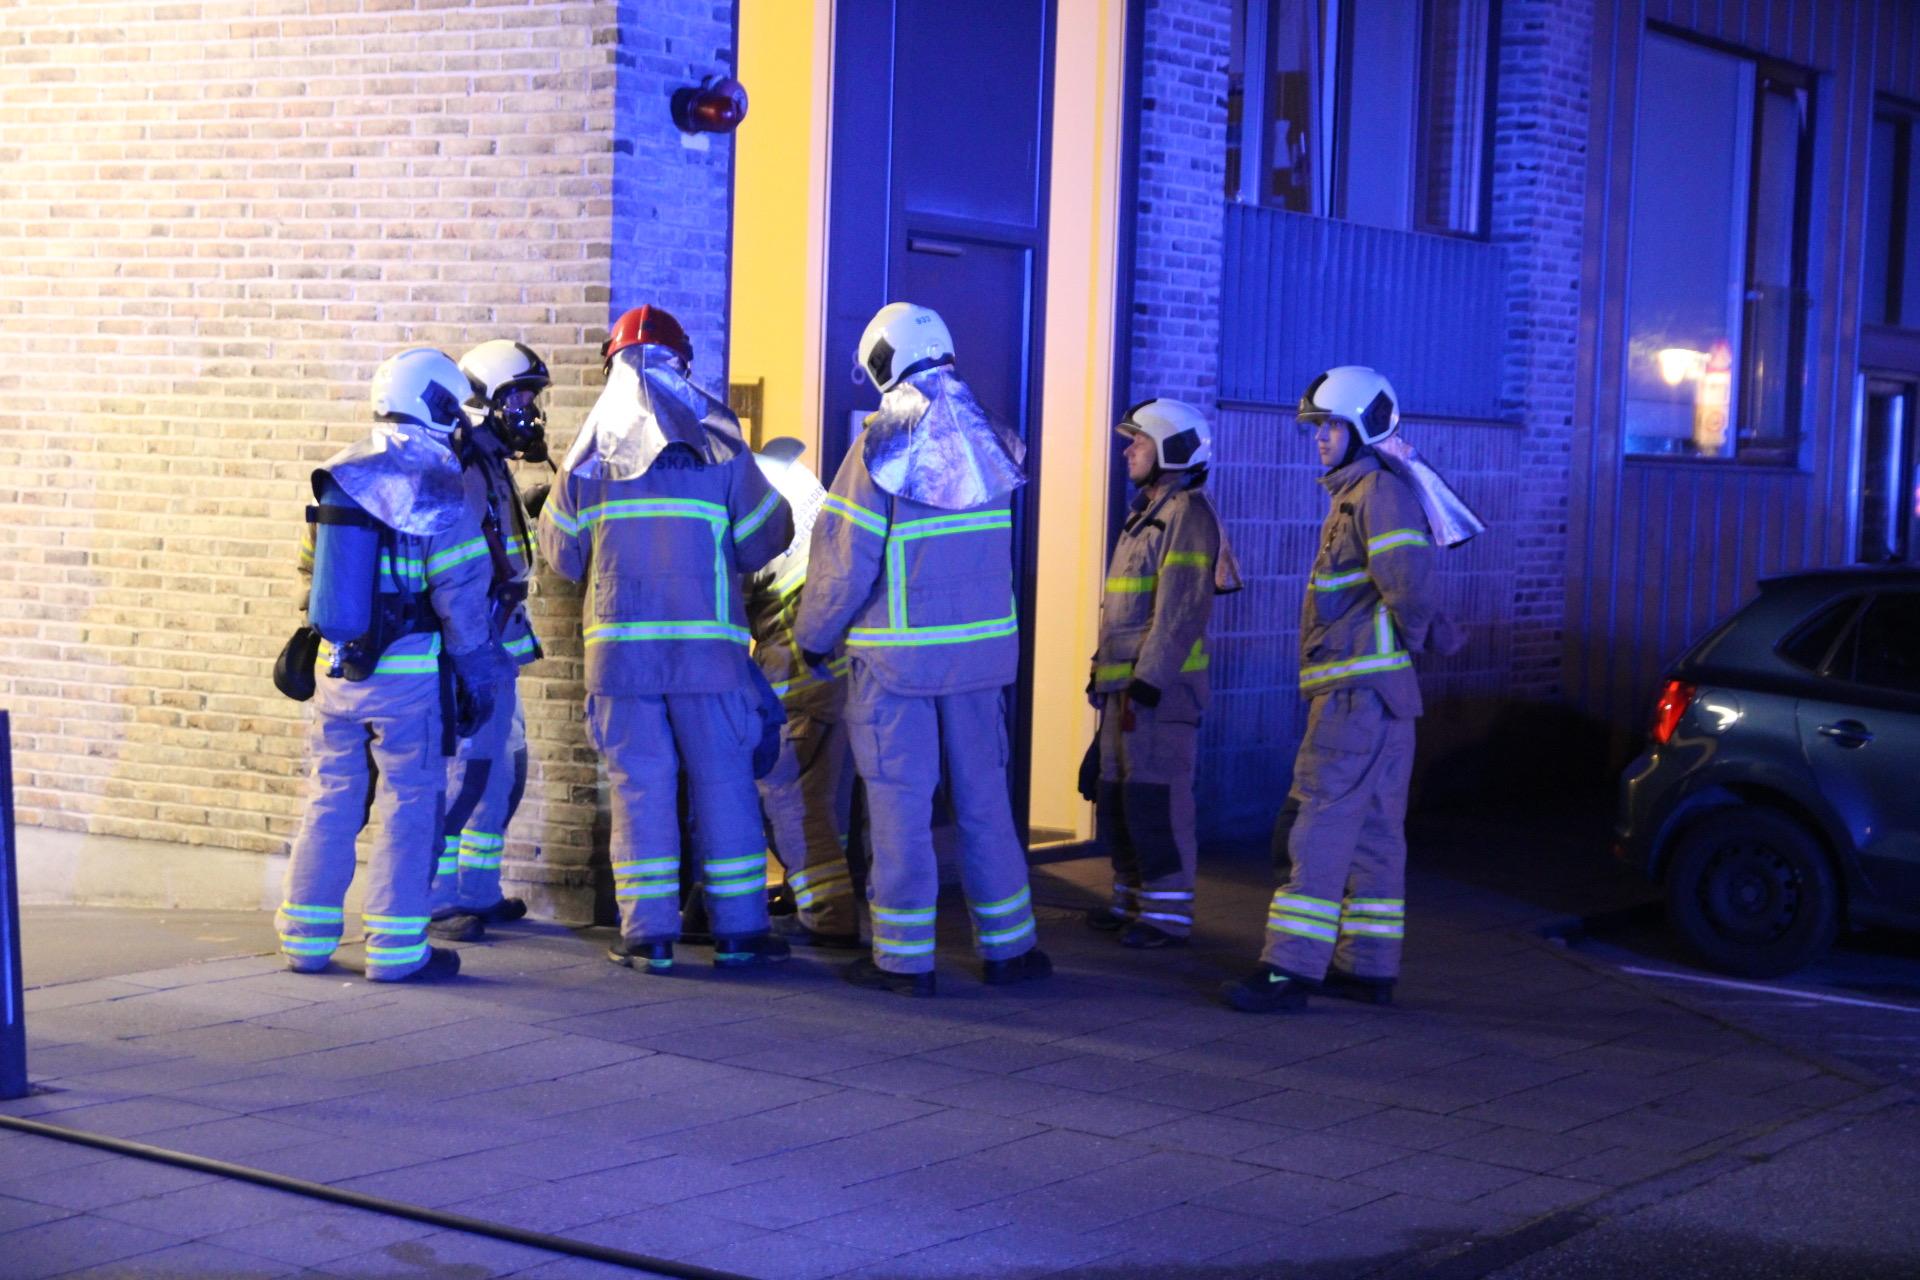 Mindre brand i kælder med kemikalier